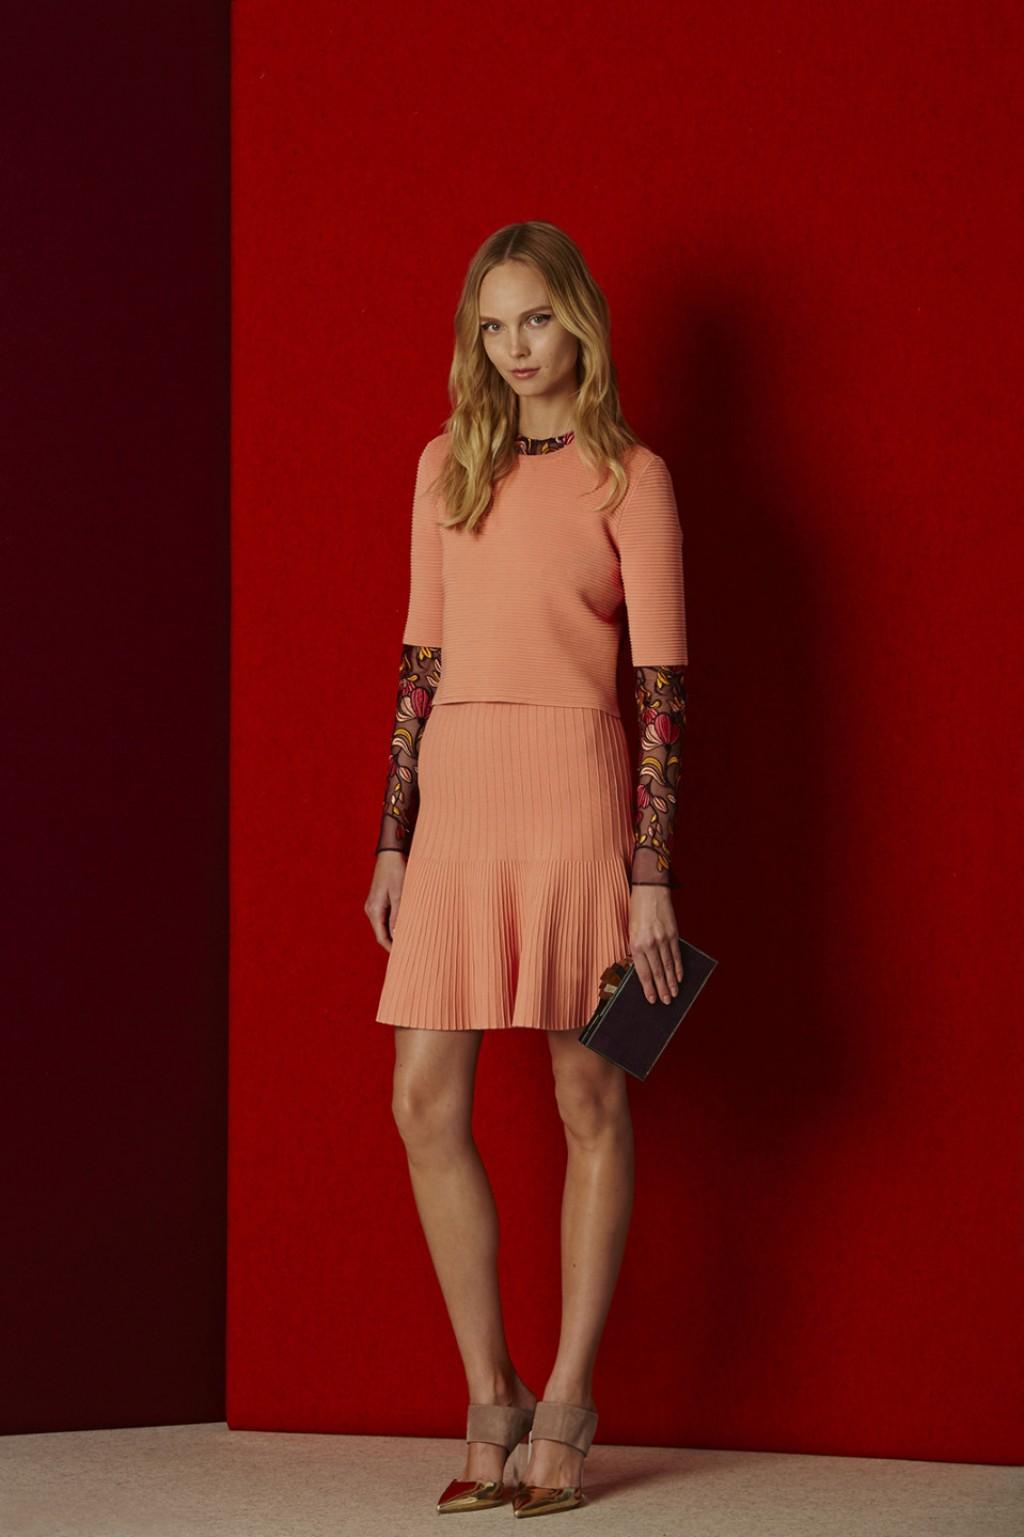 Lela-Rose-Dress-1024x1537